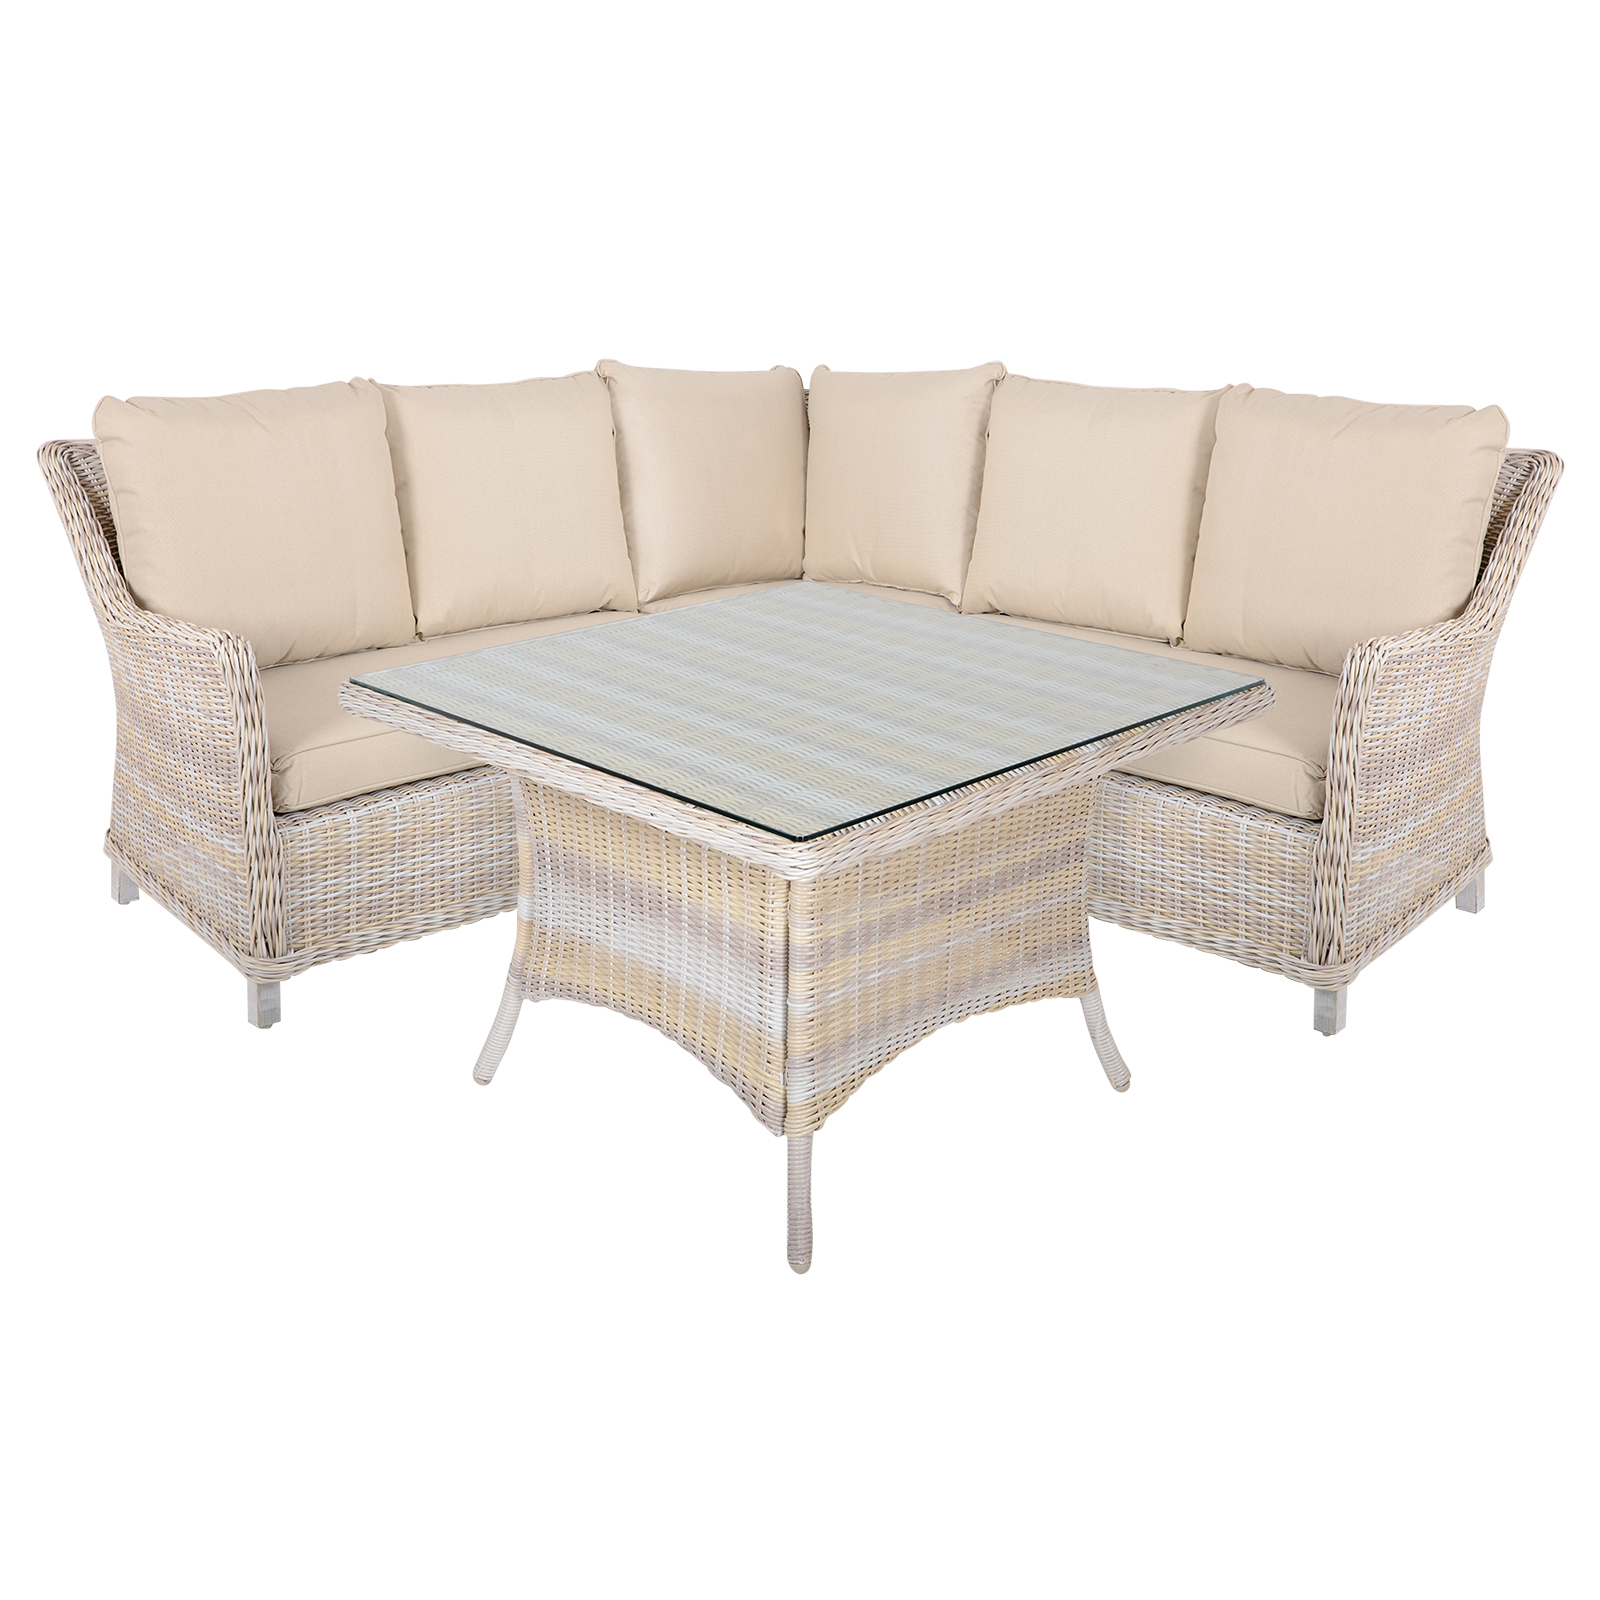 garden corner sofa with dining table modular chile rattan barbados furniture patio outdoor lounge